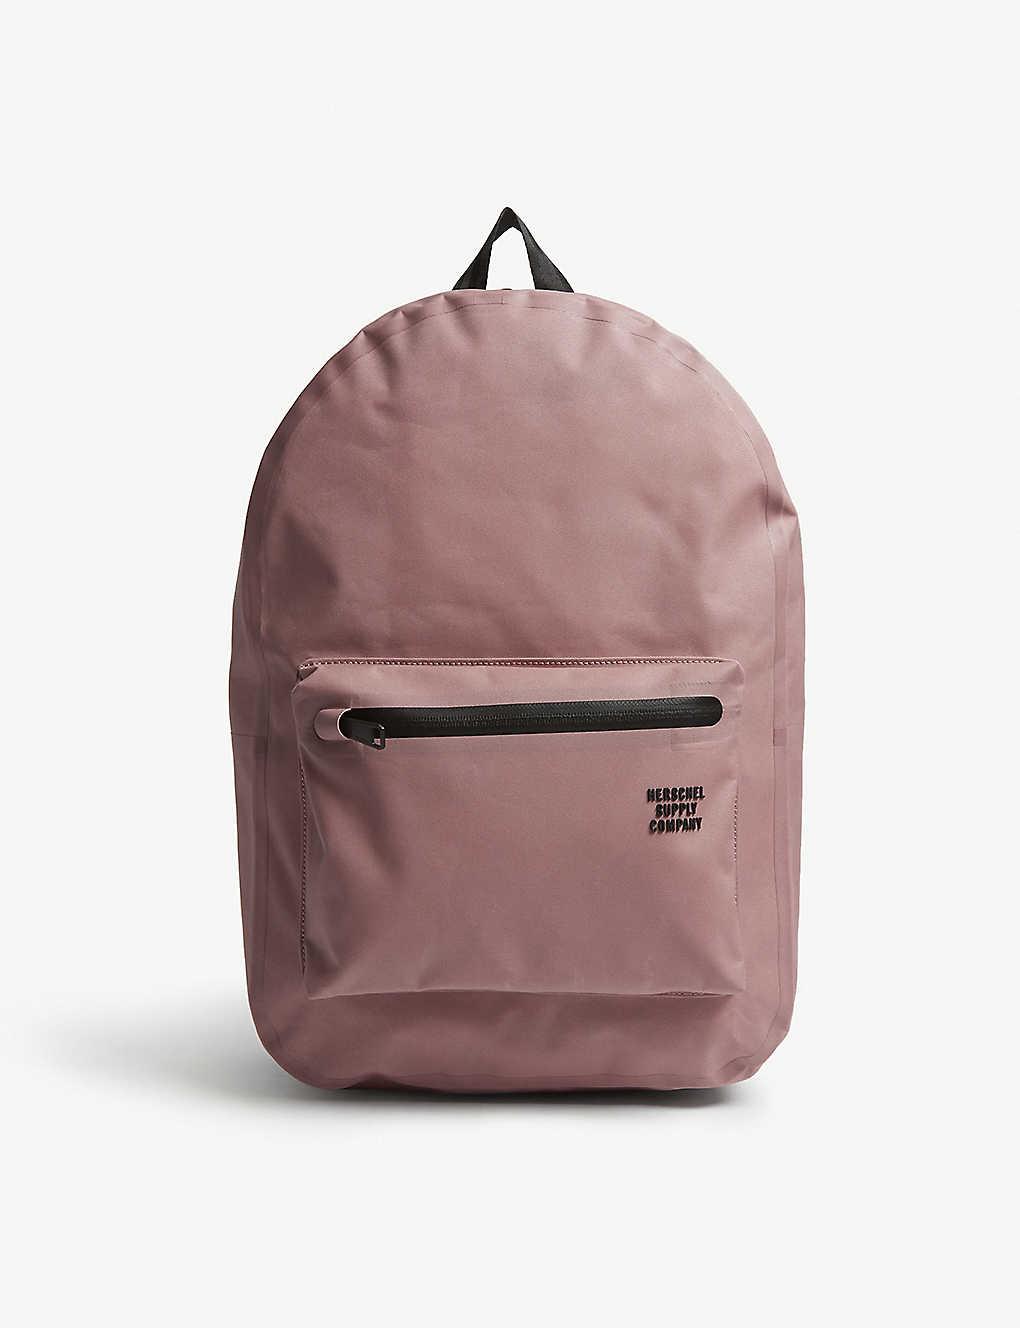 a076f8f5912 HERSCHEL SUPPLY CO - Studio Settlement tarpaulin backpack ...